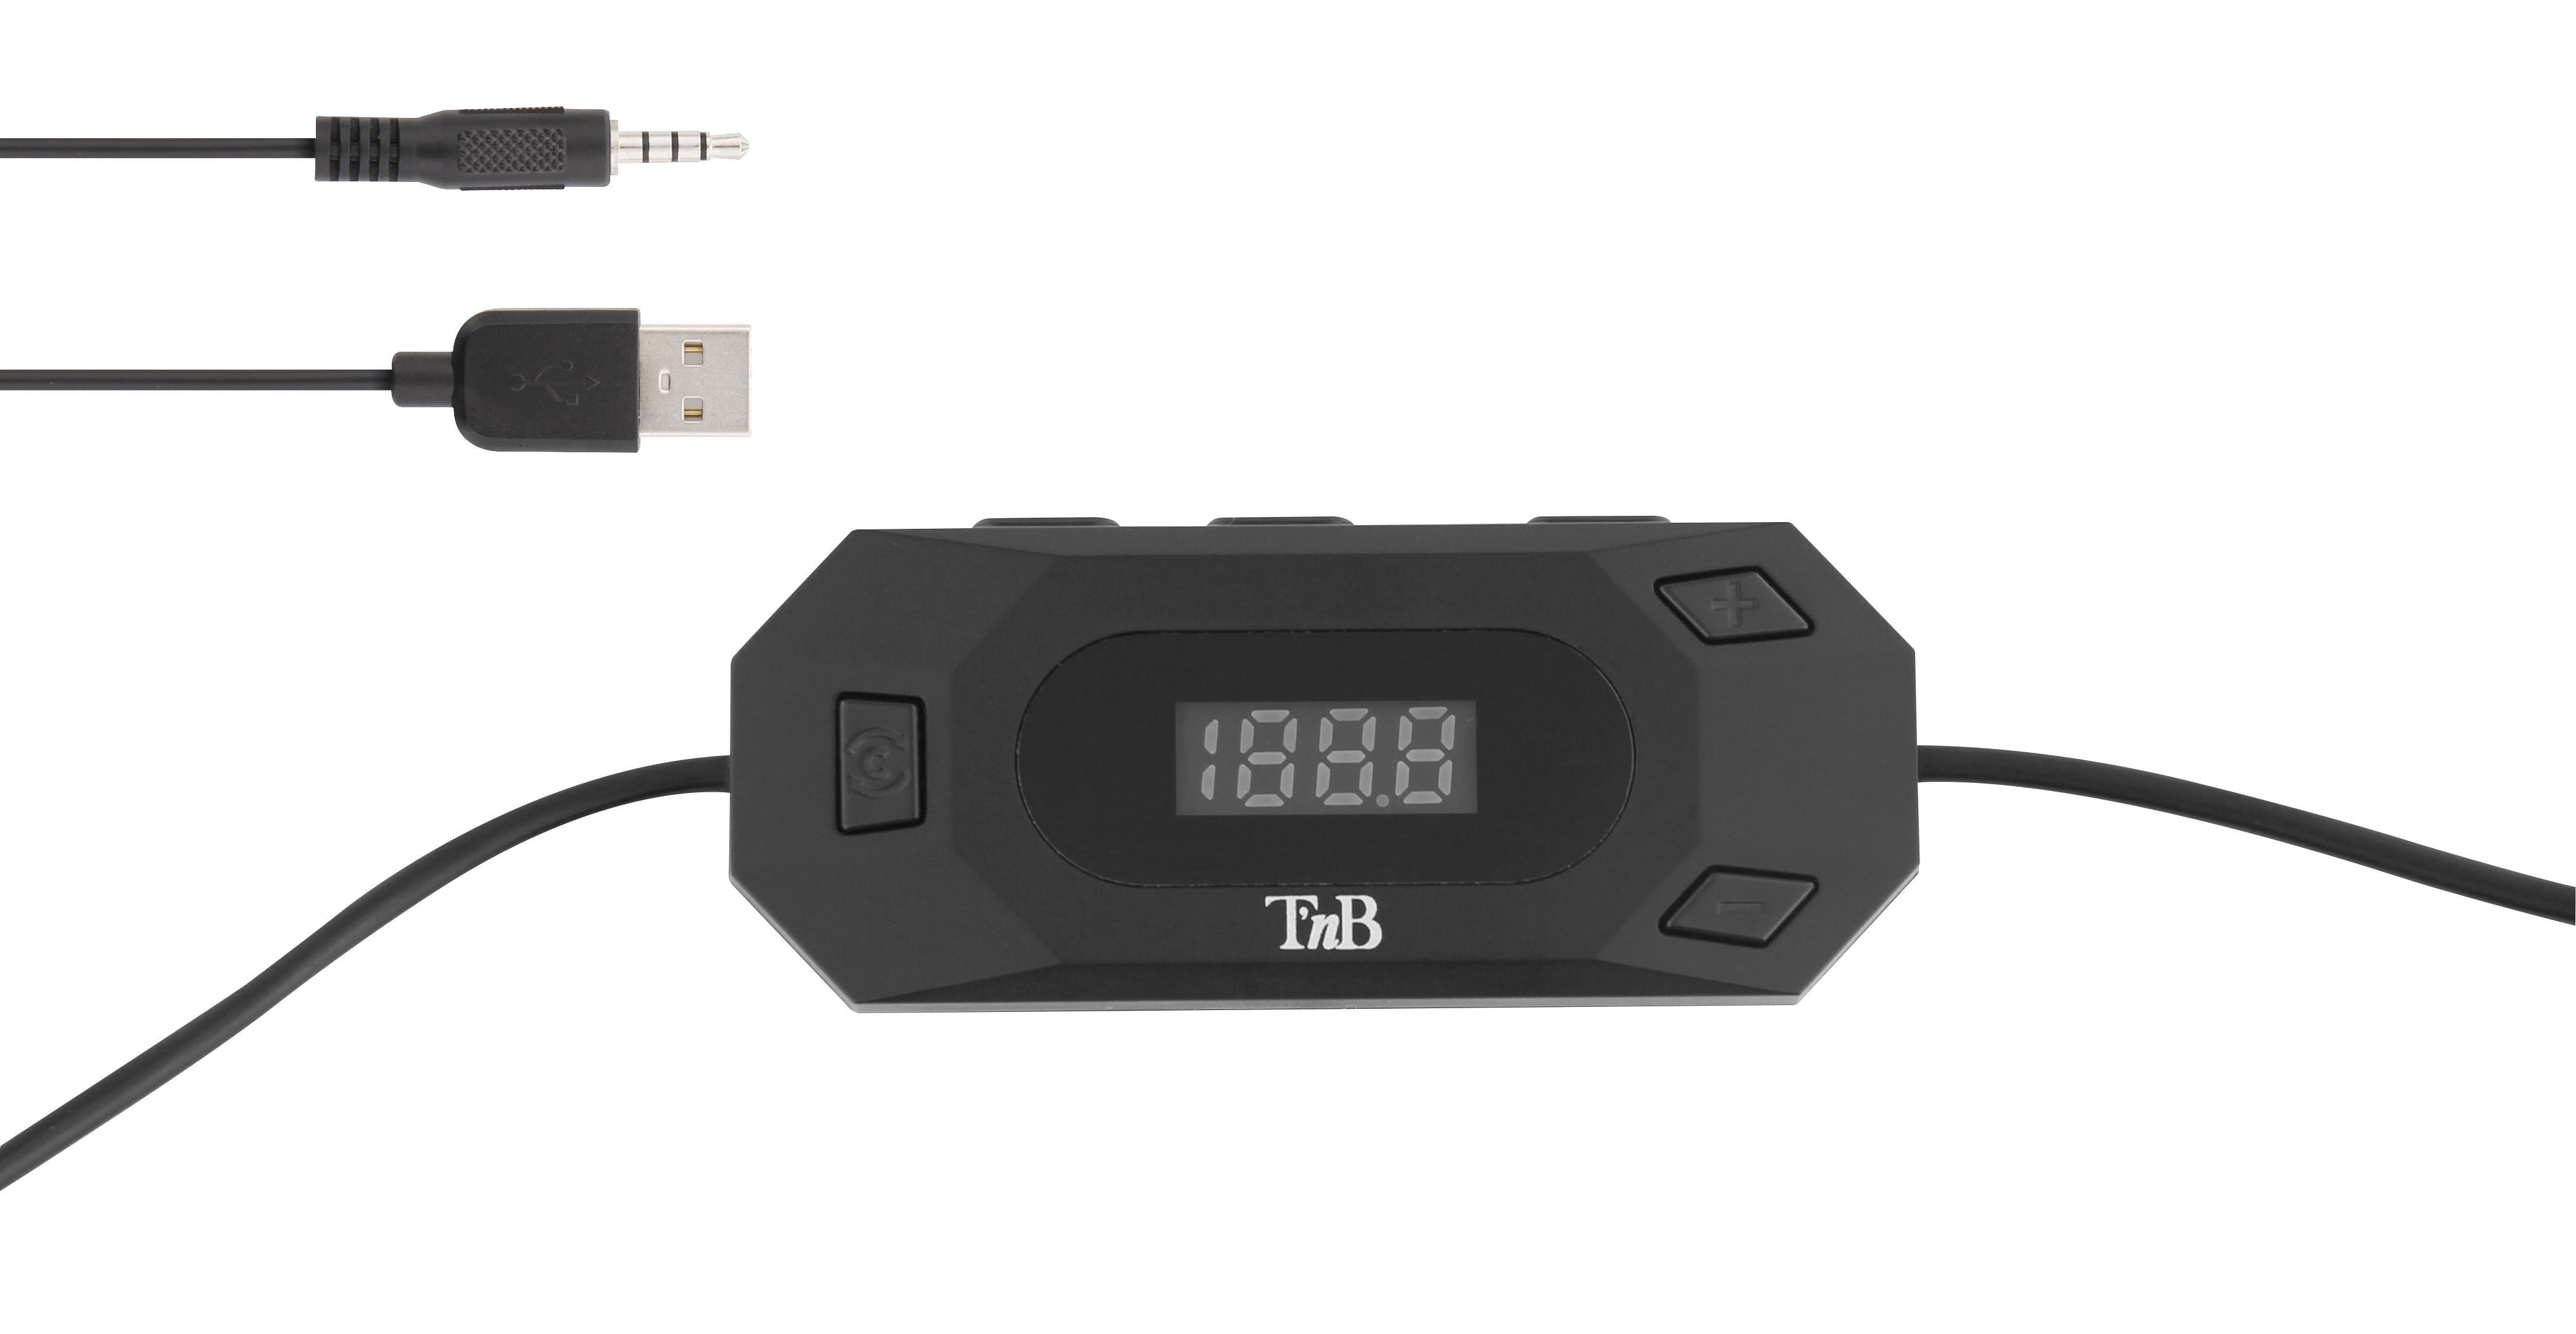 FM transmitter TnB 8707 expert knowledge